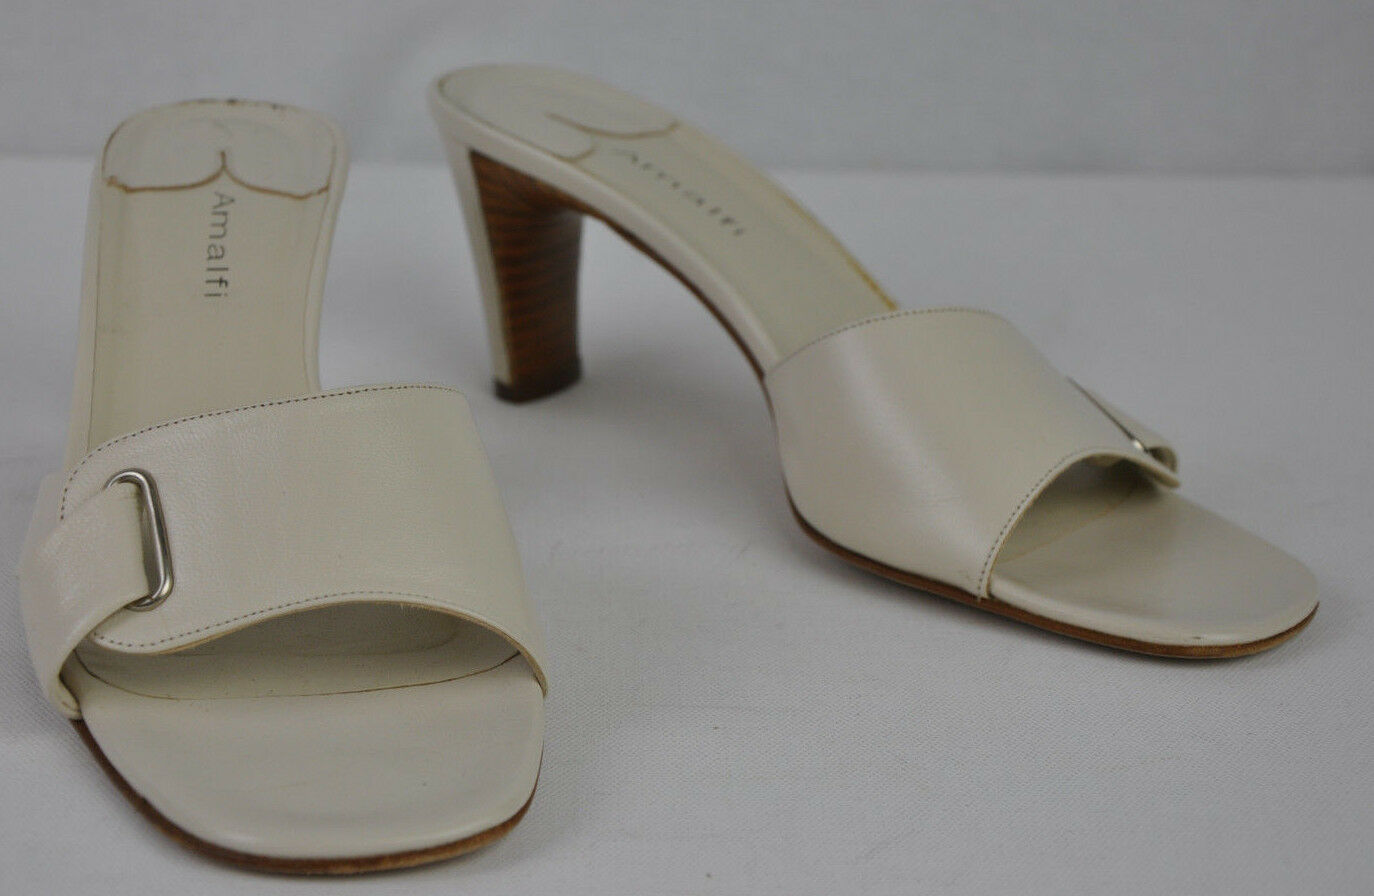 9C Amalfi Nordstrom Cream Leder Open Toe Slip On Slide Mule Heel Wide Sz